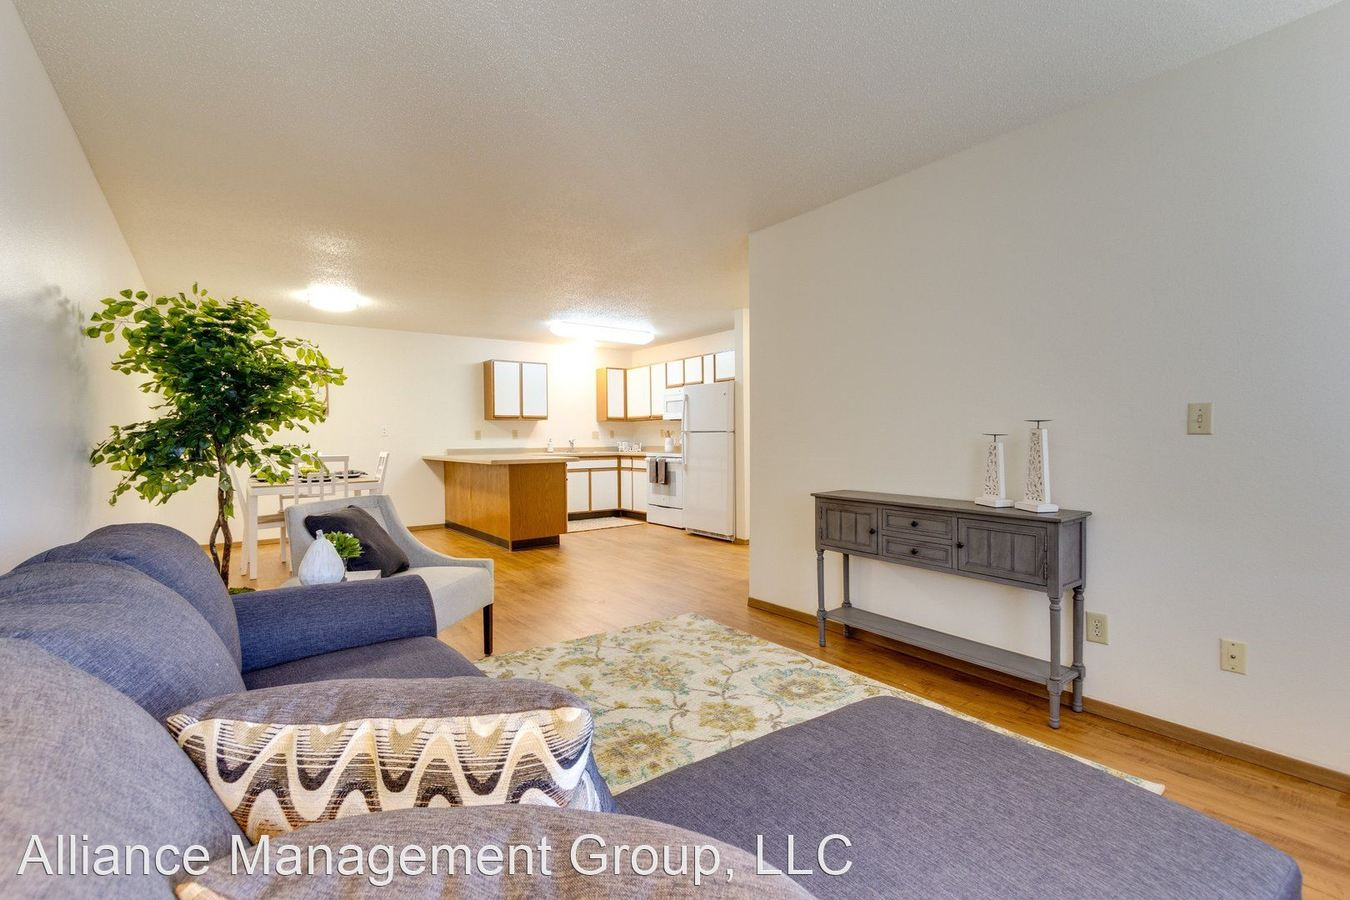 2 Bedrooms 2 Bathrooms Apartment for rent at 1704-1736 Dakota Dr in Fargo, ND